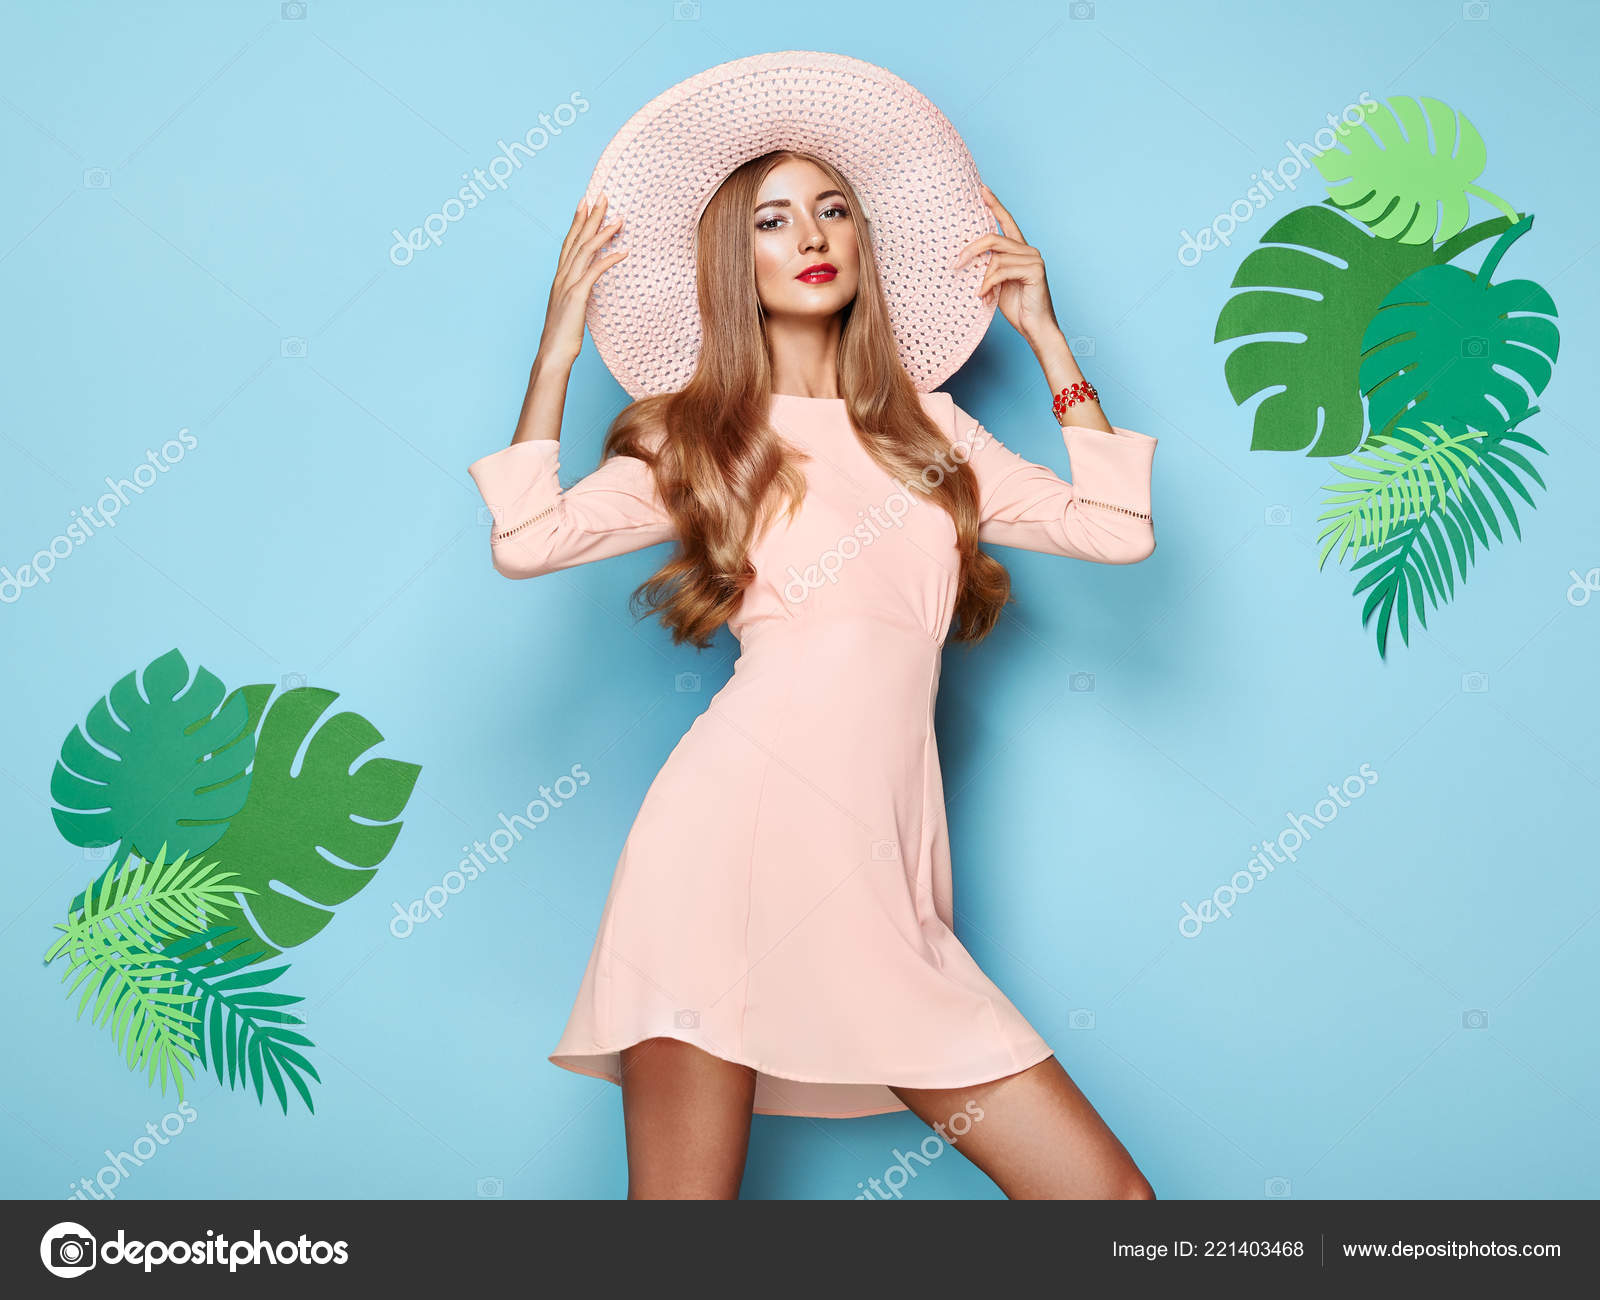 Look - Lady stylish photo video